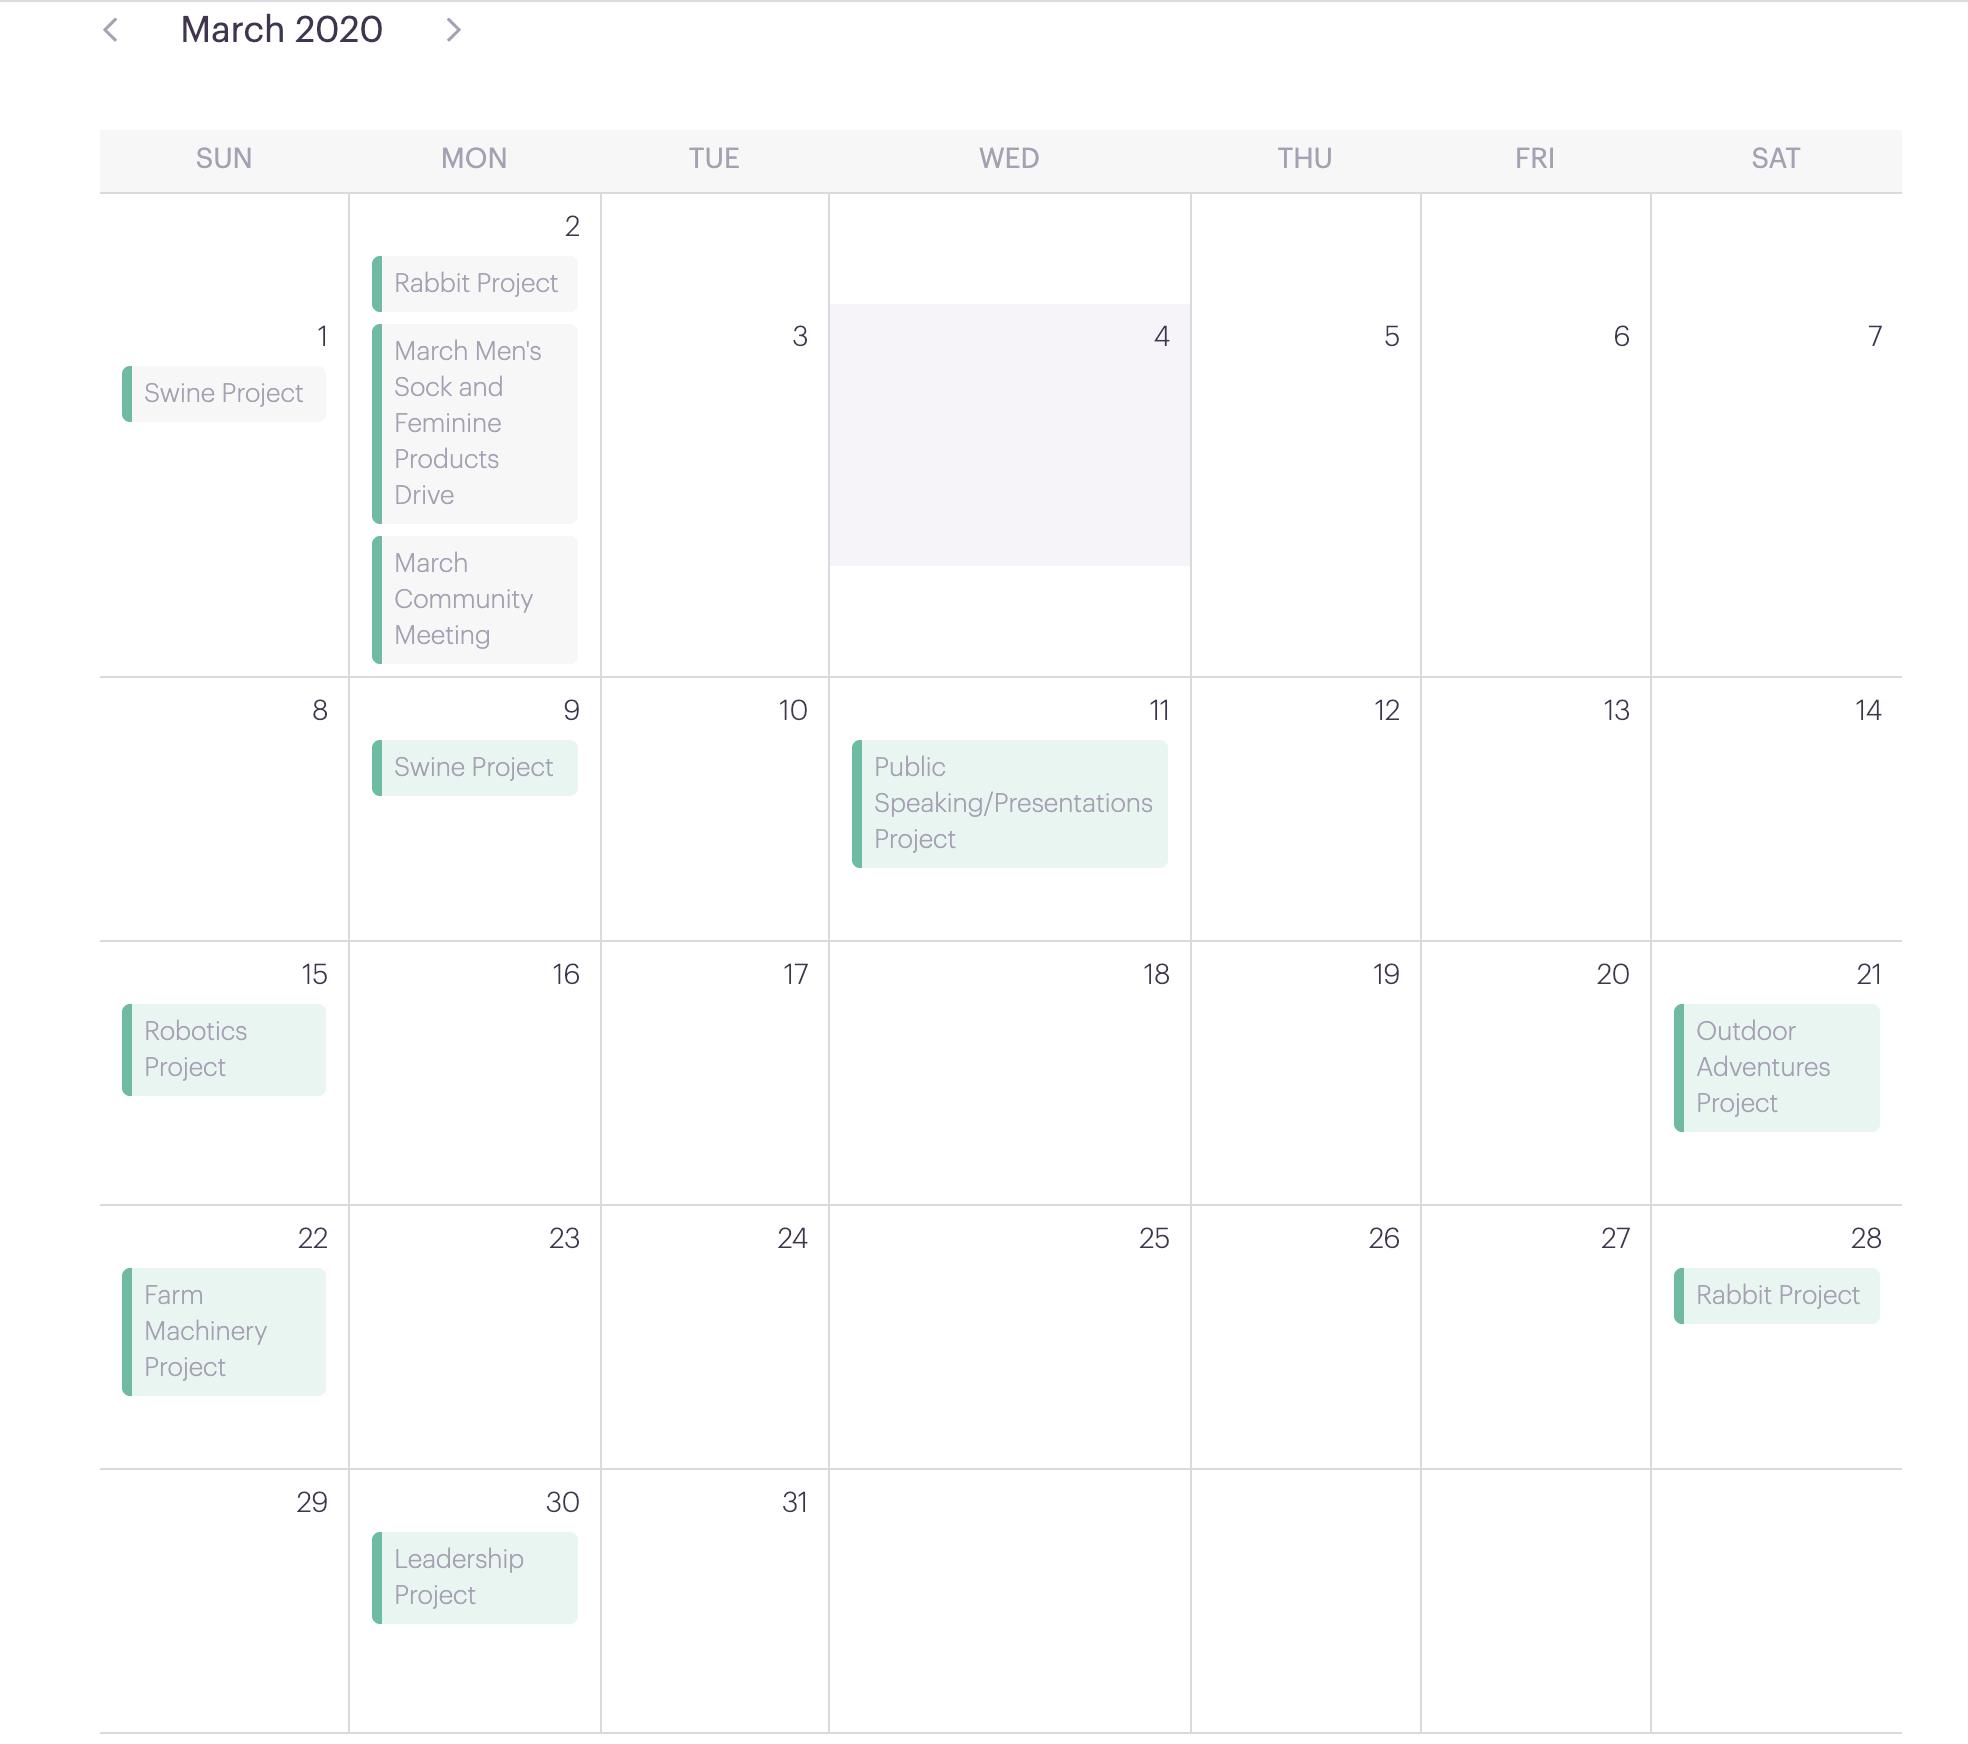 4-H Calendar Example PlanHero Club Tool